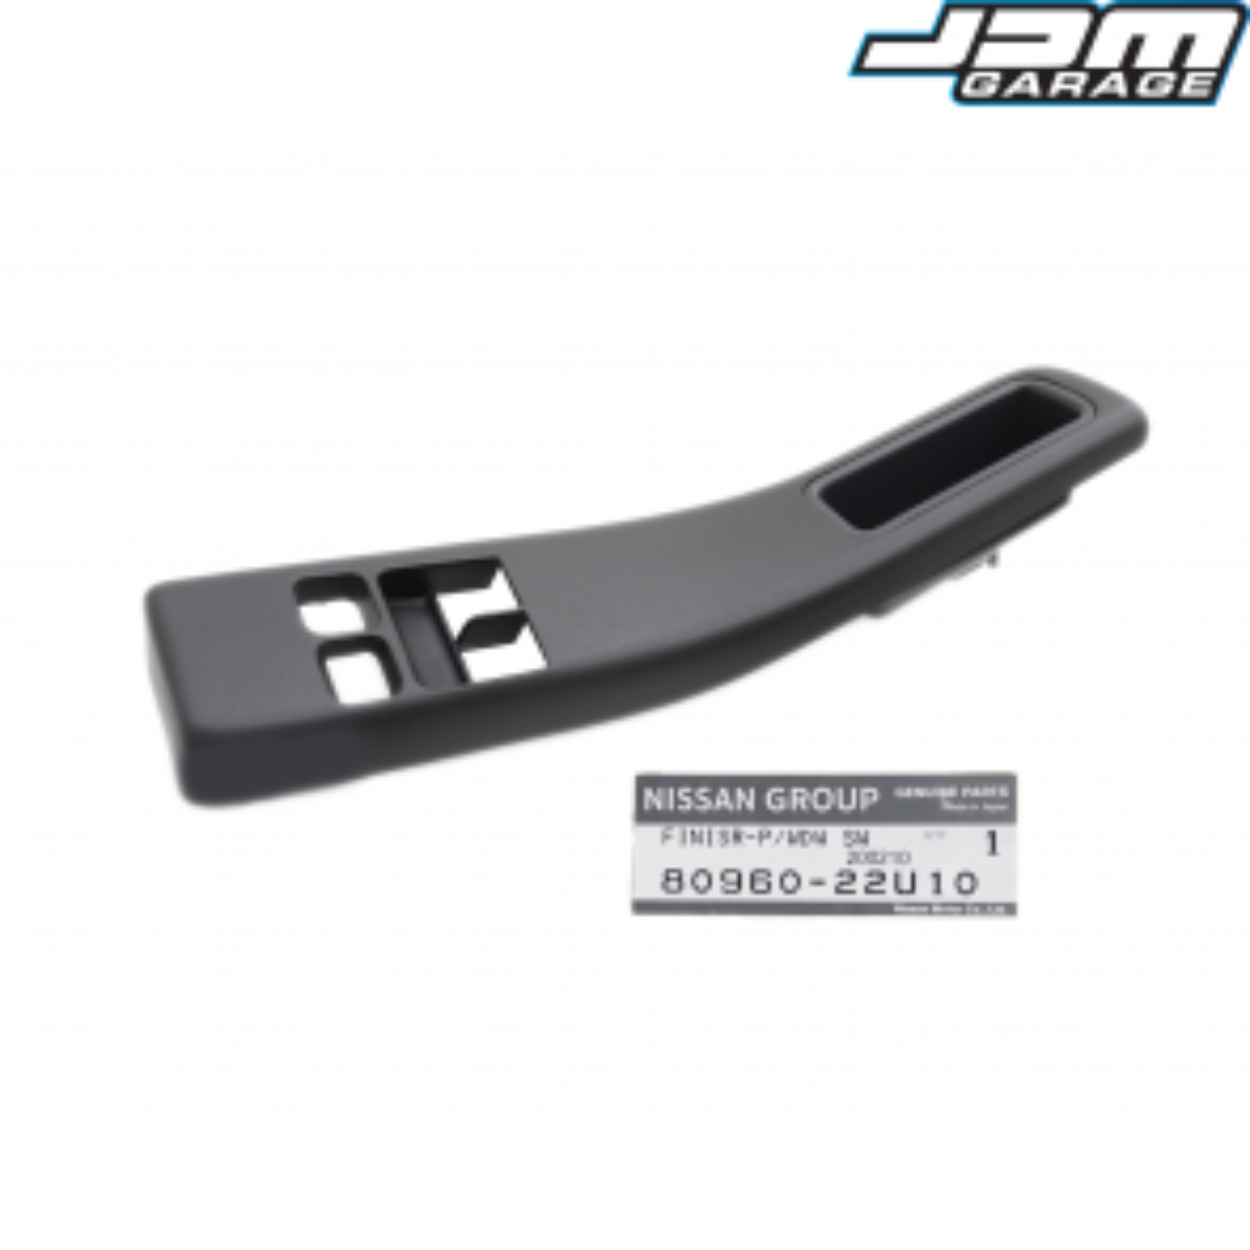 Genuine Nissan Drivers Side Power Window Switch Cover Front Finisher For Skyline R33 GTS GTST GTR 80960-22U10